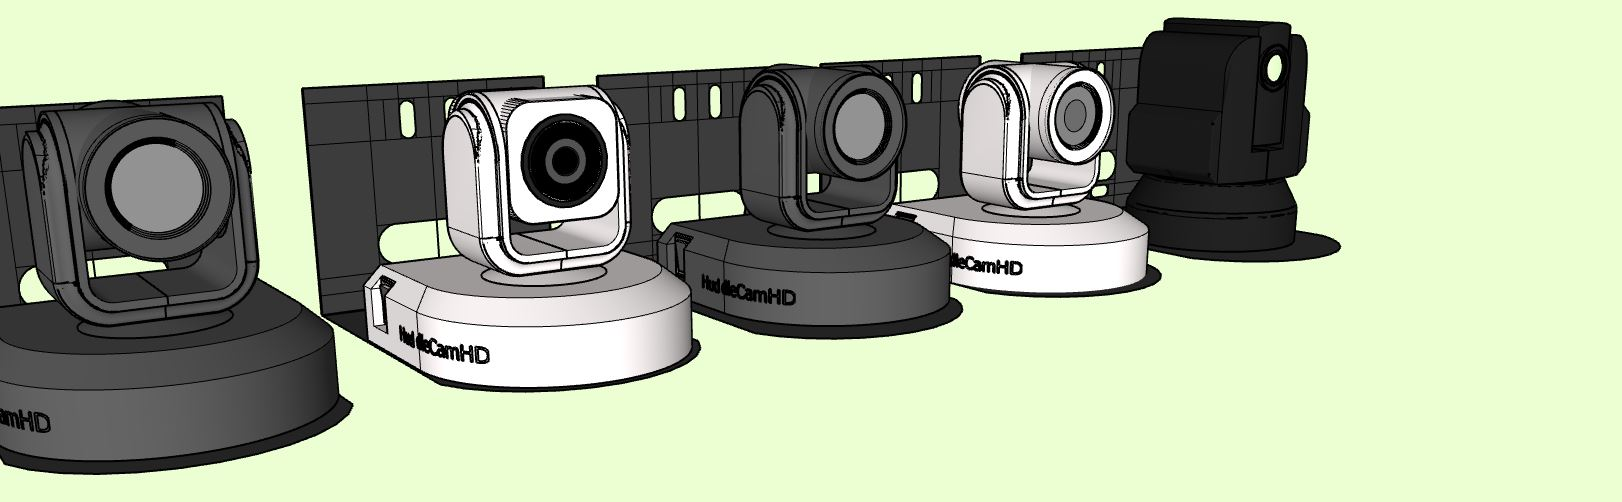 3D HuddleCAmHD Layouts.jpg